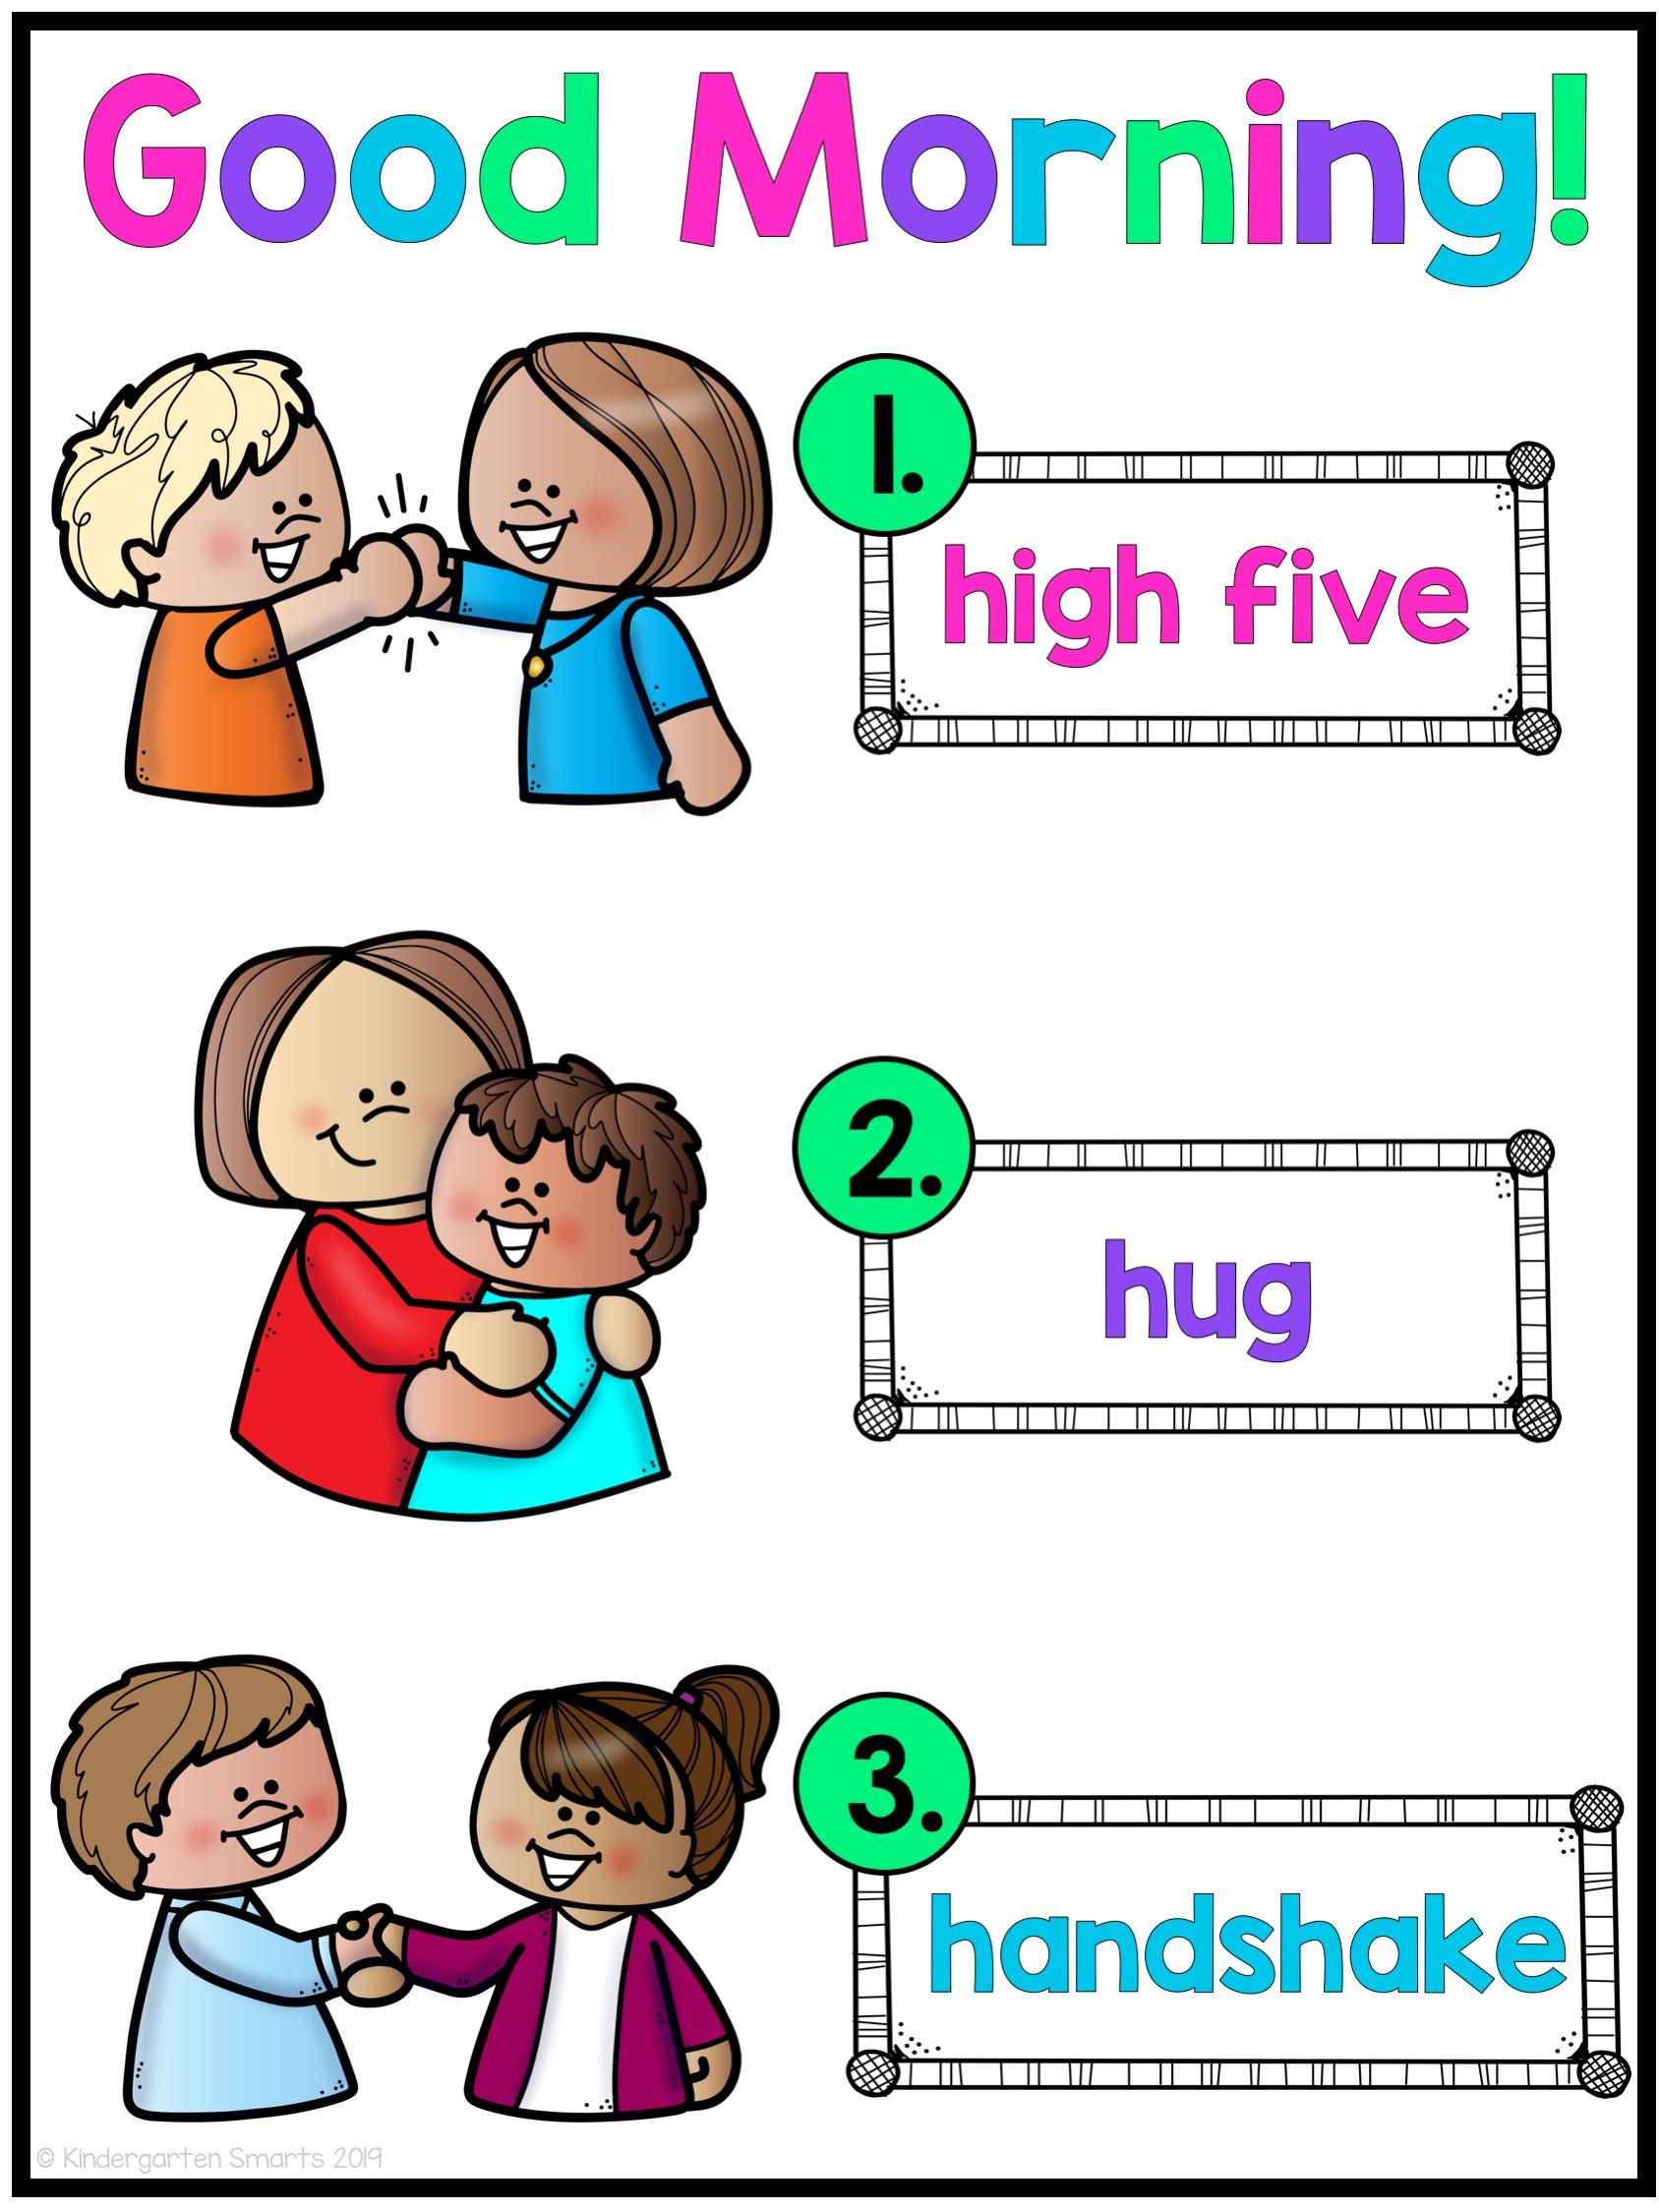 morning greeting pic - Kindergarten Smarts